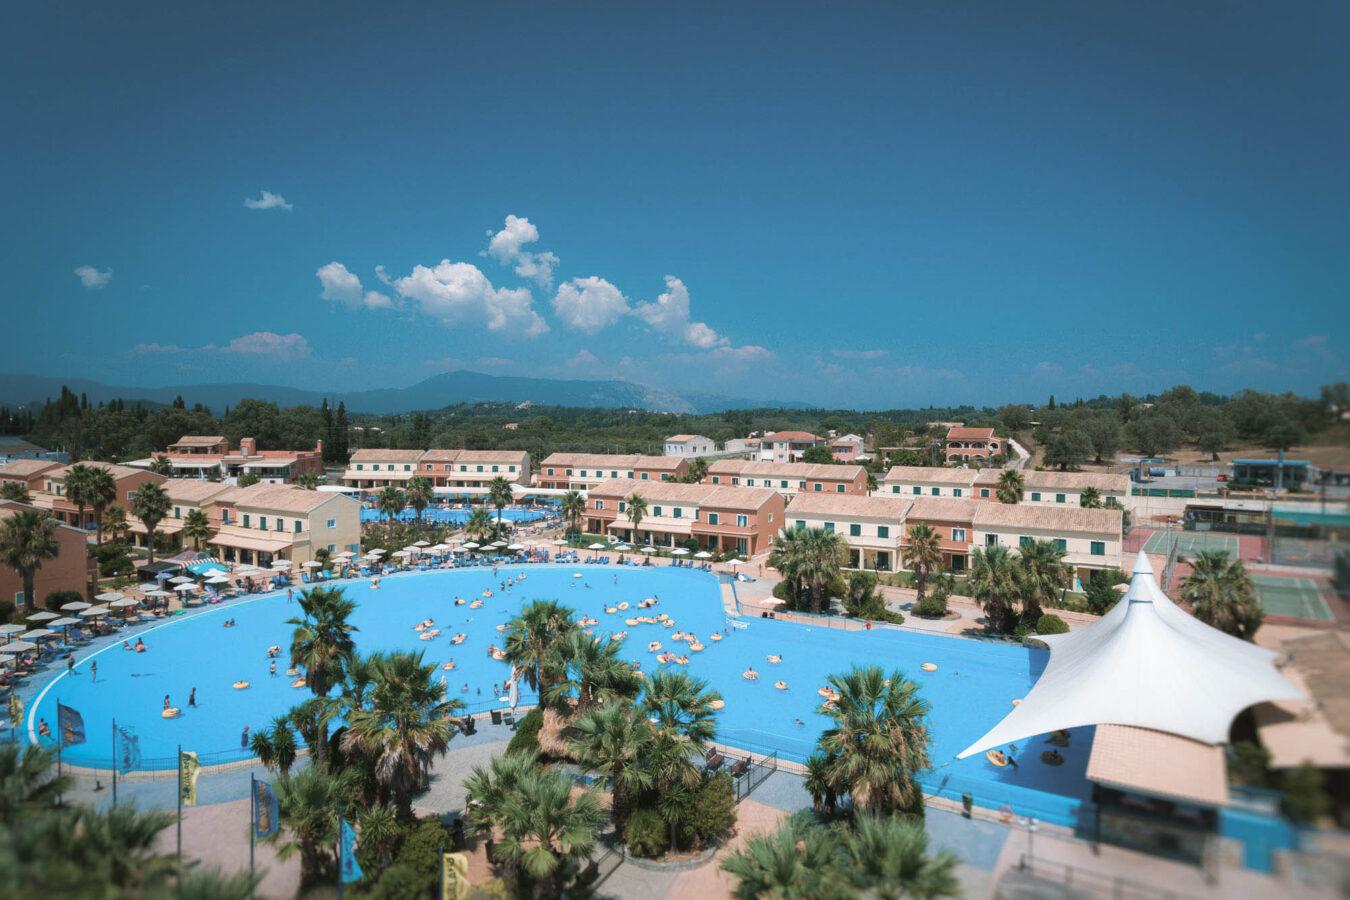 Aqualand Hotel in Corfu 10 scaled